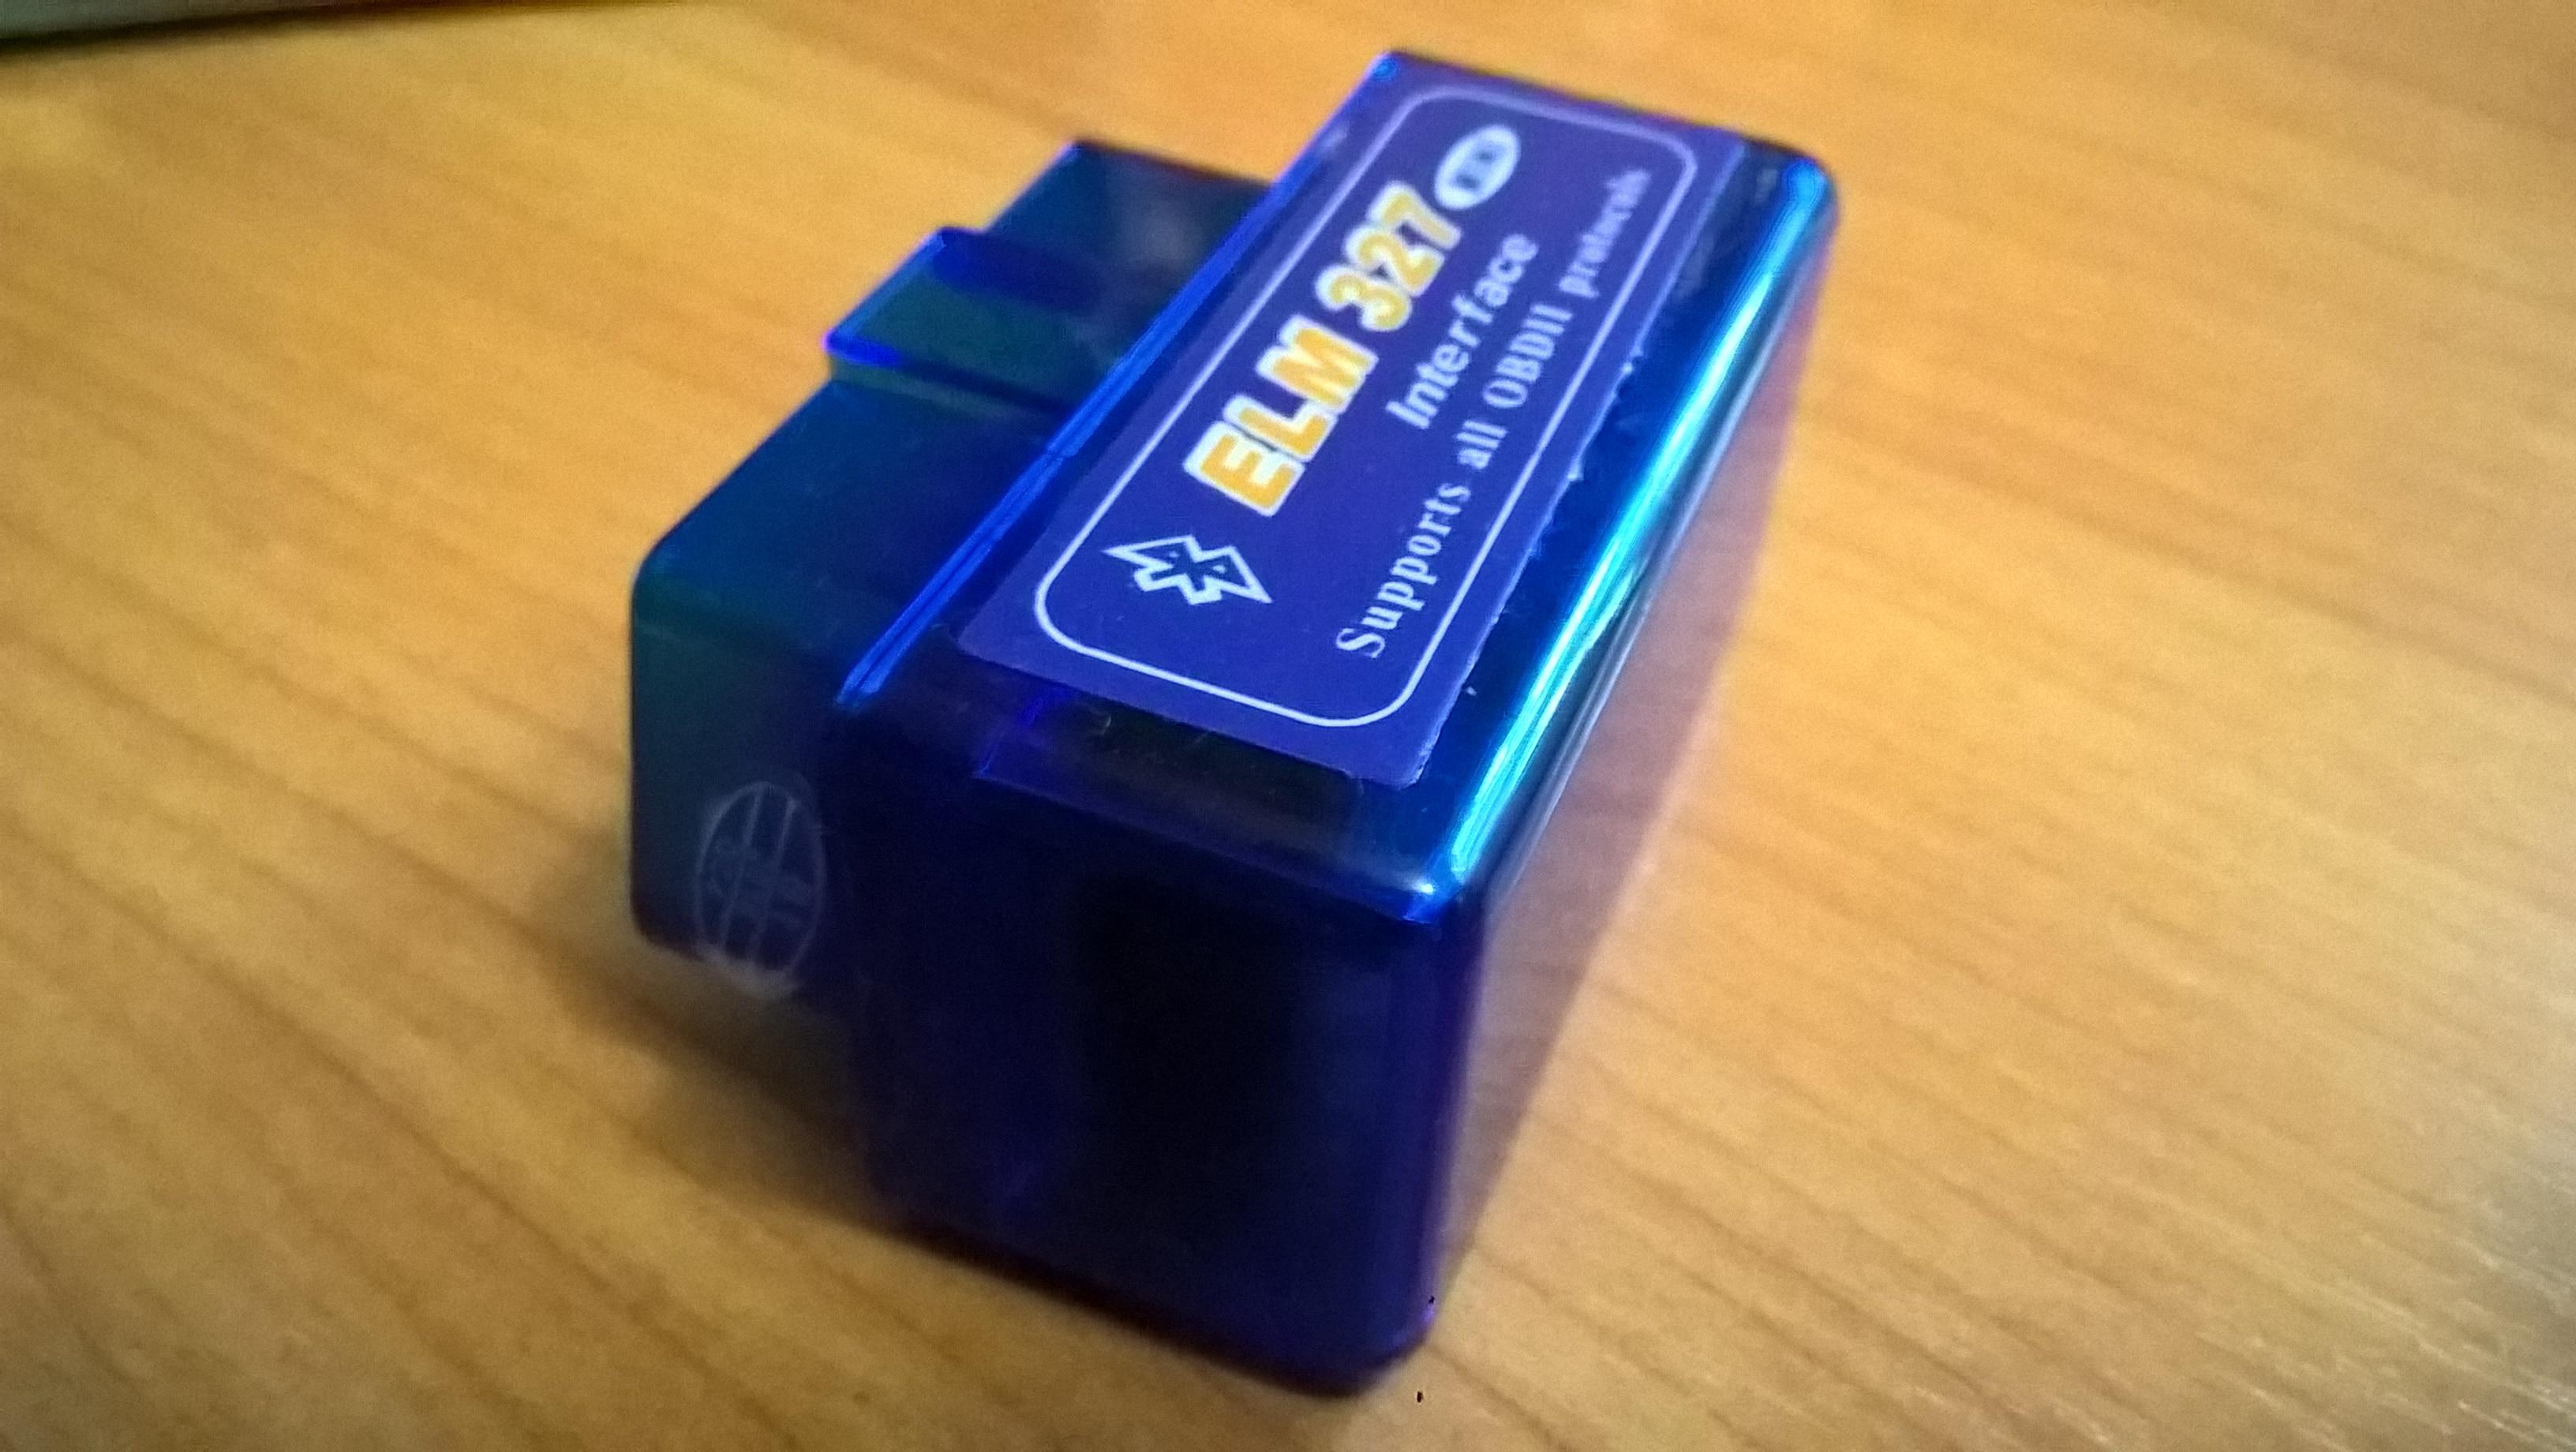 Супер Мини elm327 Bluetooth OBD2 V1.5 Elm 327 В 1,5 OBD 2 автомобиля диагностический инструмент сканер Elm-327 OBDII адаптер инструмент диагностики авто